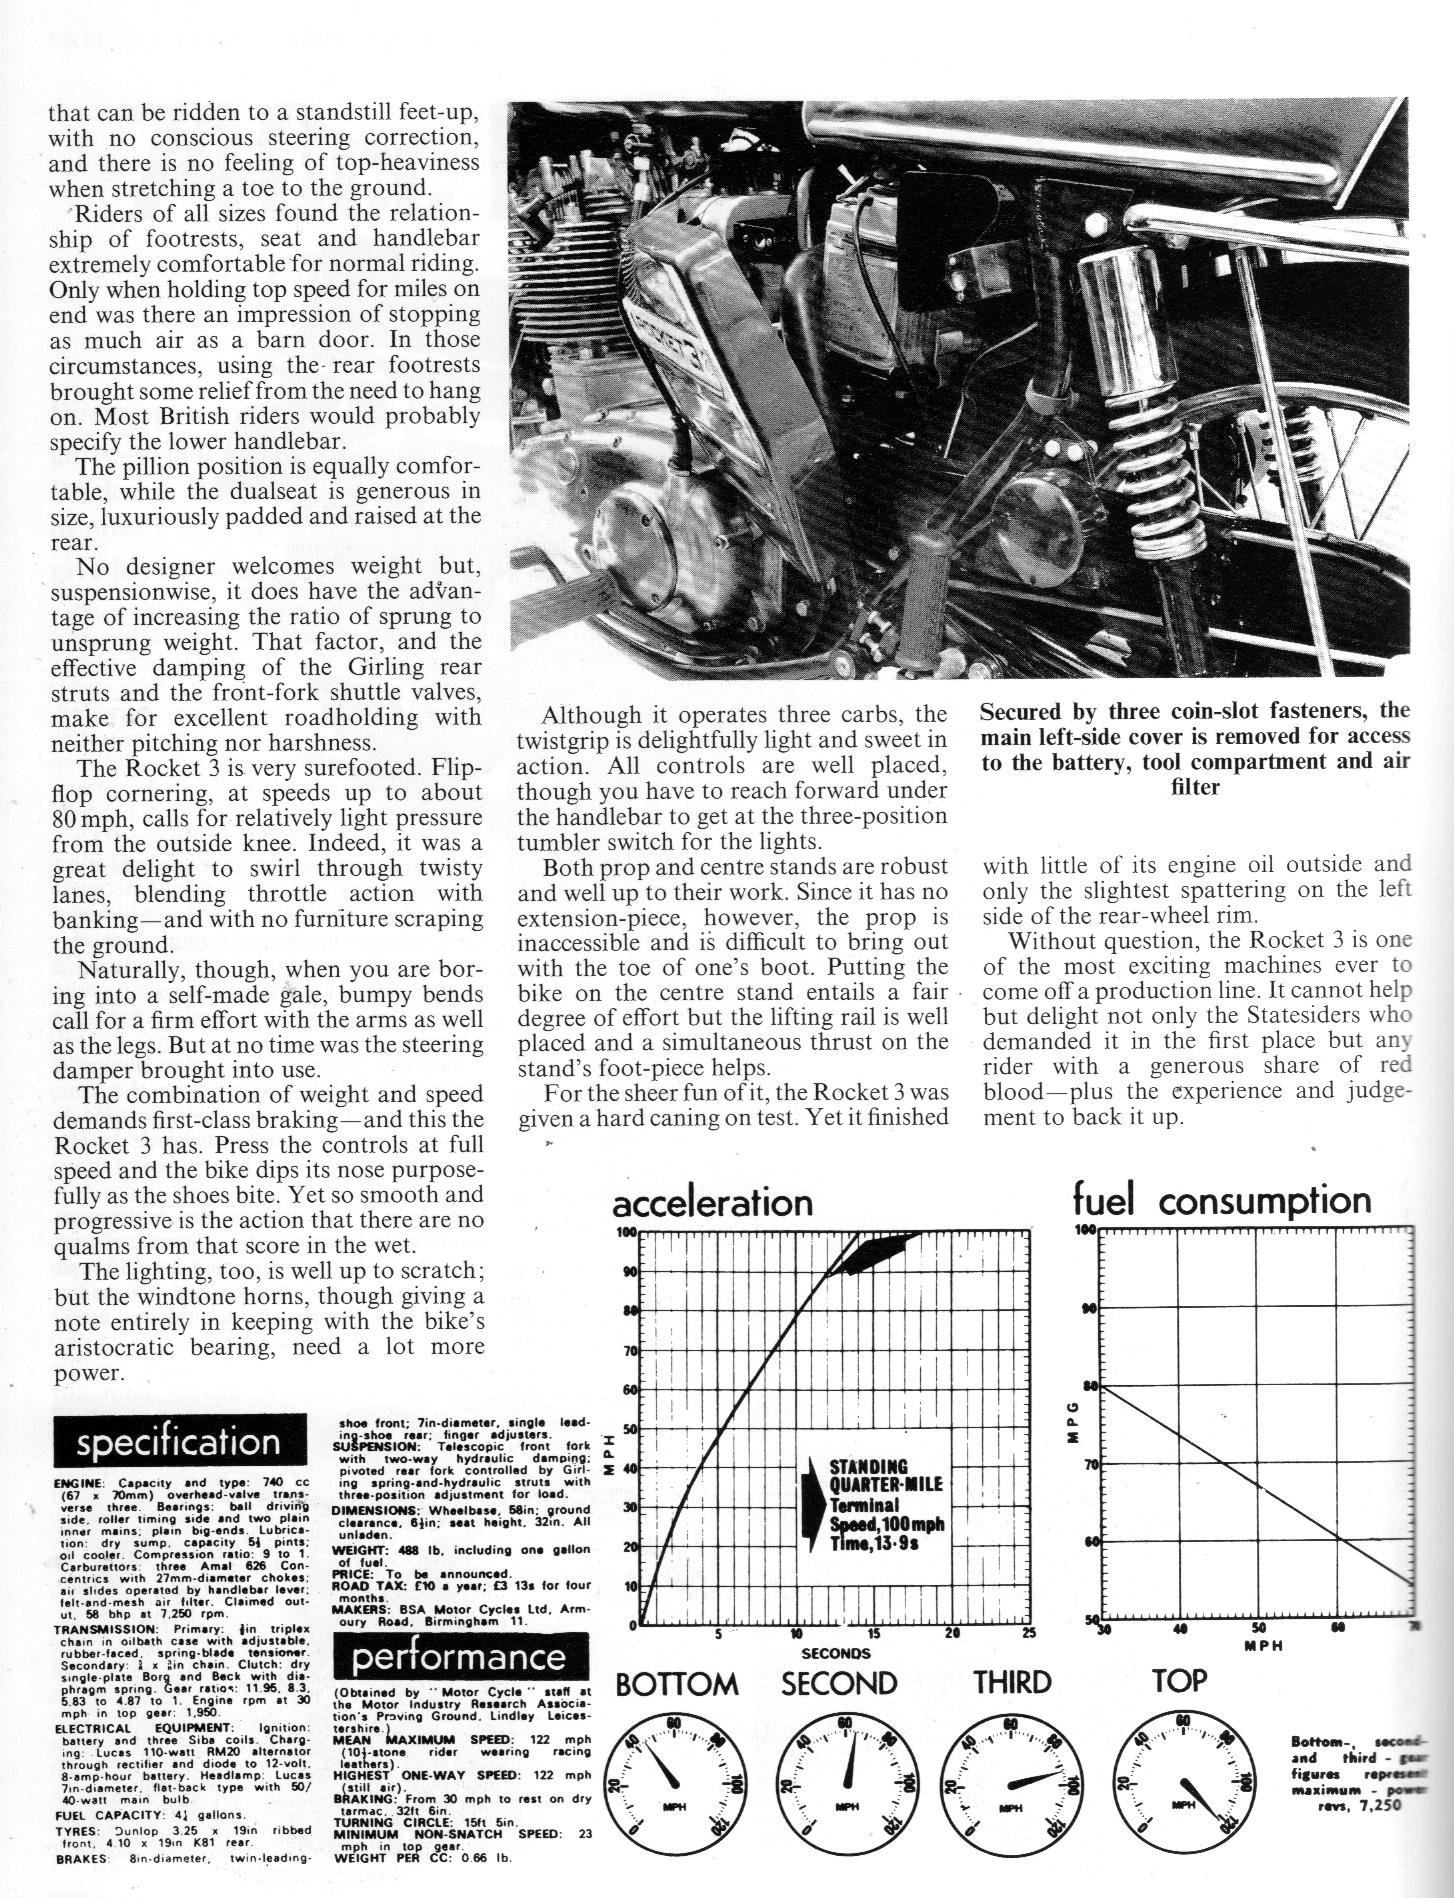 1968 BSA Rocket 3 740 road test 3.jpg